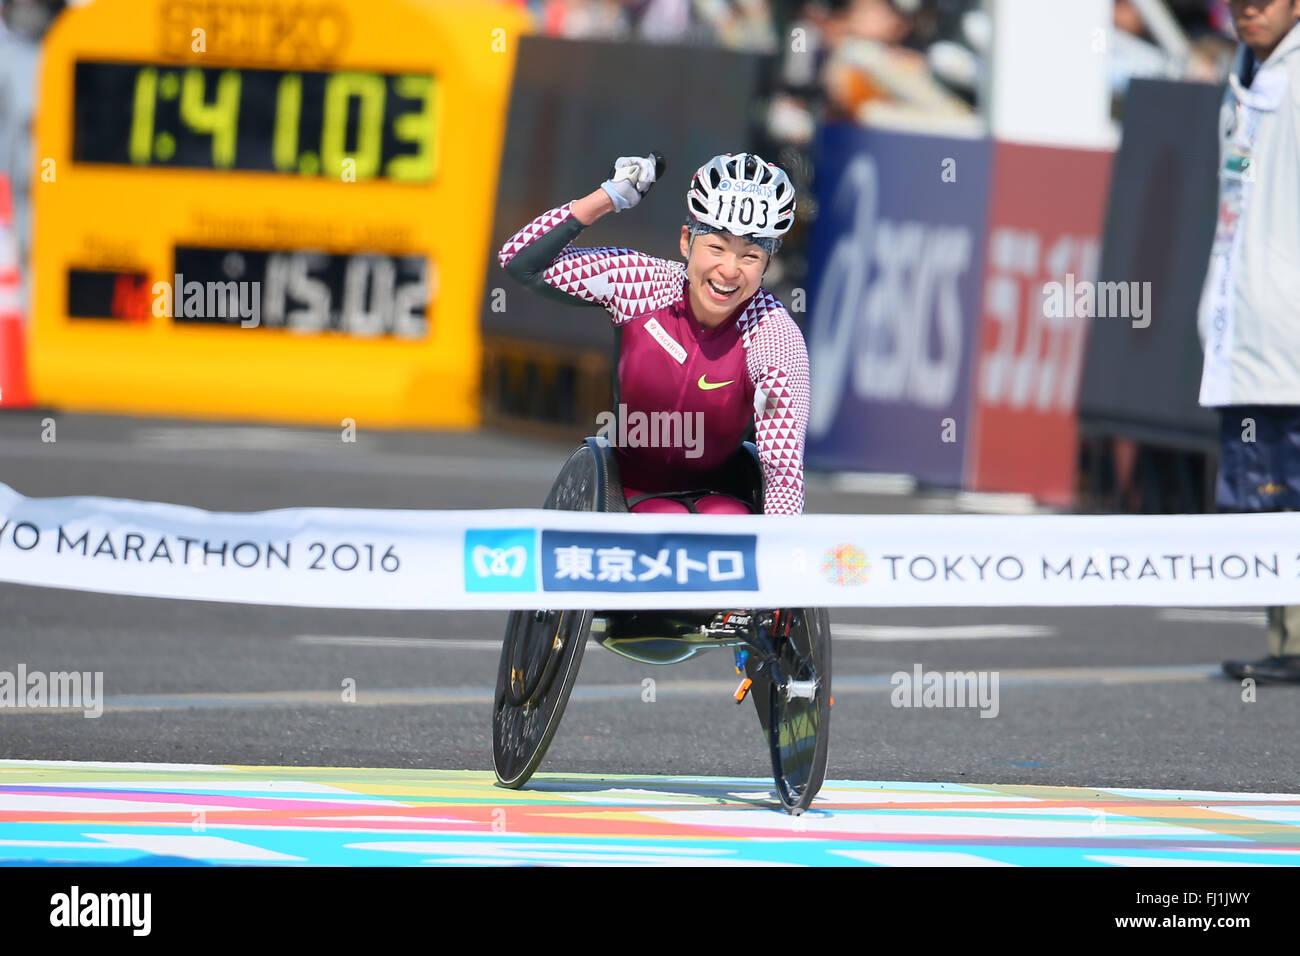 Tokio, Japón. 28 Feb, 2016. Wakako Tsuchida (JPN) Maratón: Maratón de Tokio 2016 maratón en Imagen De Stock